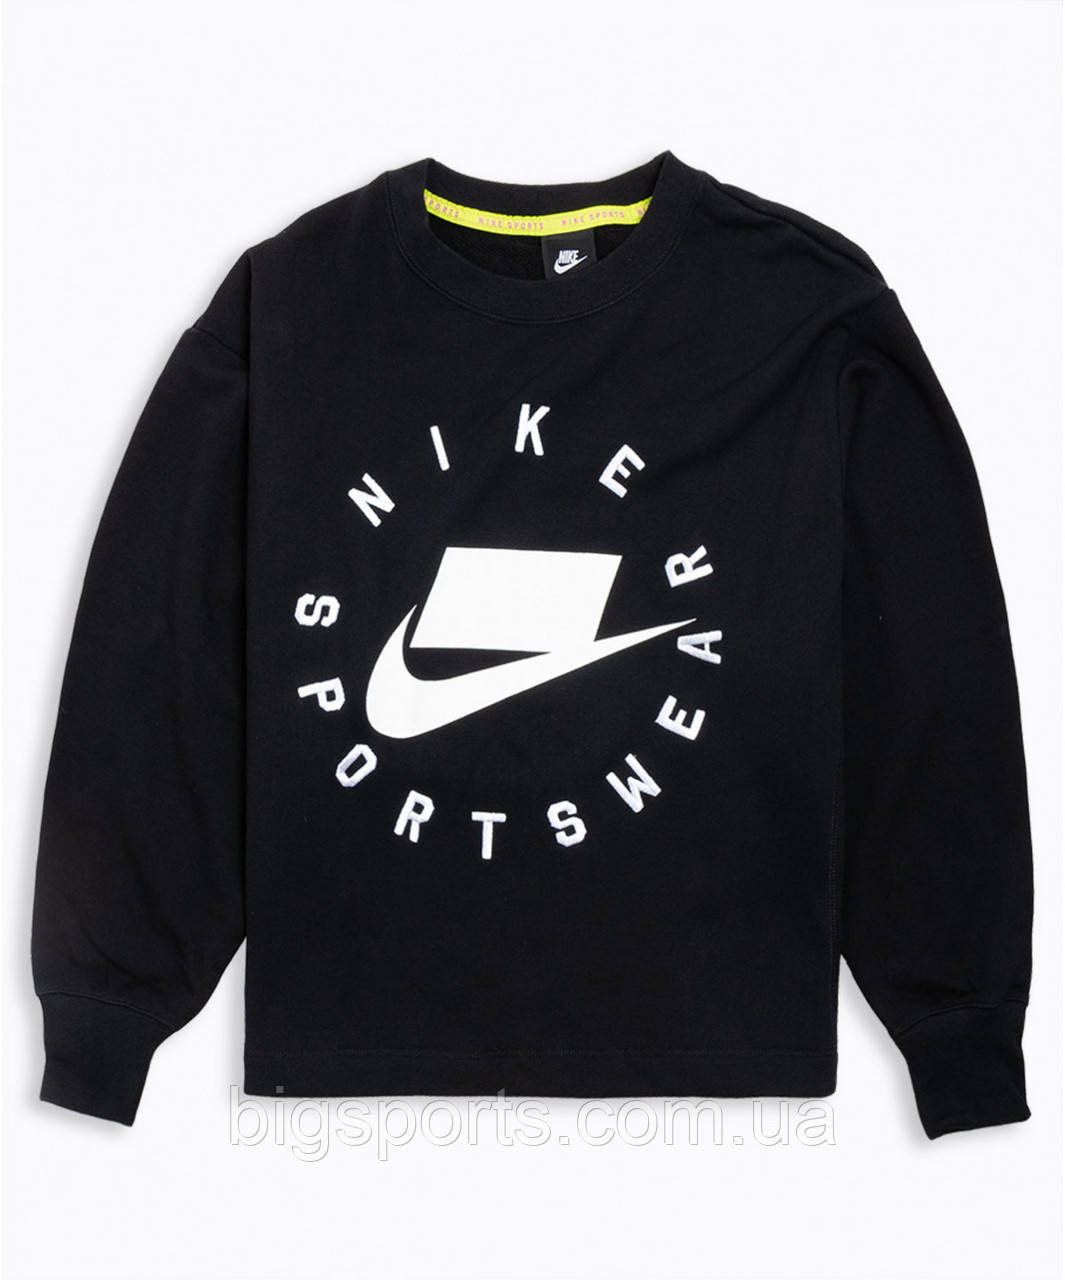 Кофта жен. Nike W Nsw Nsp Crew Flc Ft Bf (арт. AR3052-010)